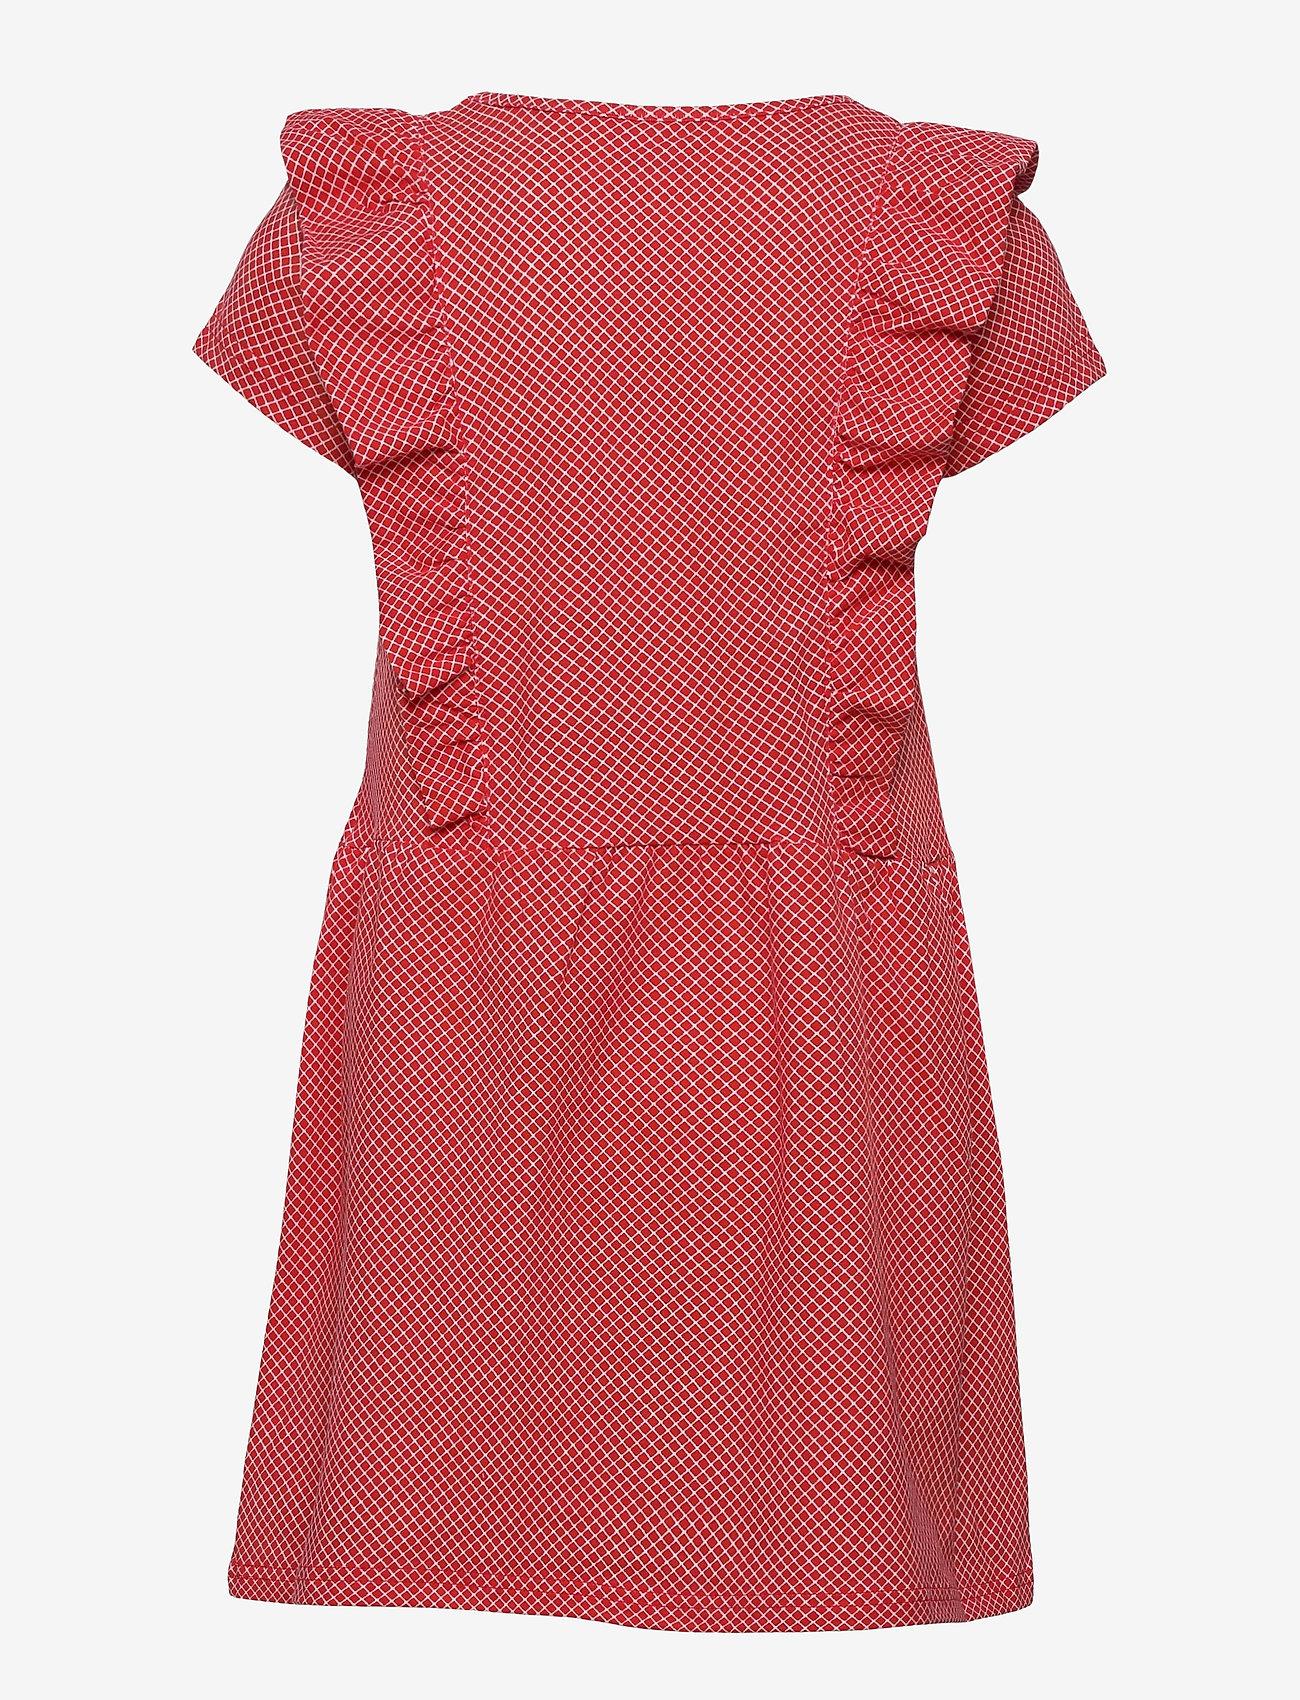 Martinex - IDA COUNTS RUFFLE DRESS - kleider - red - 1